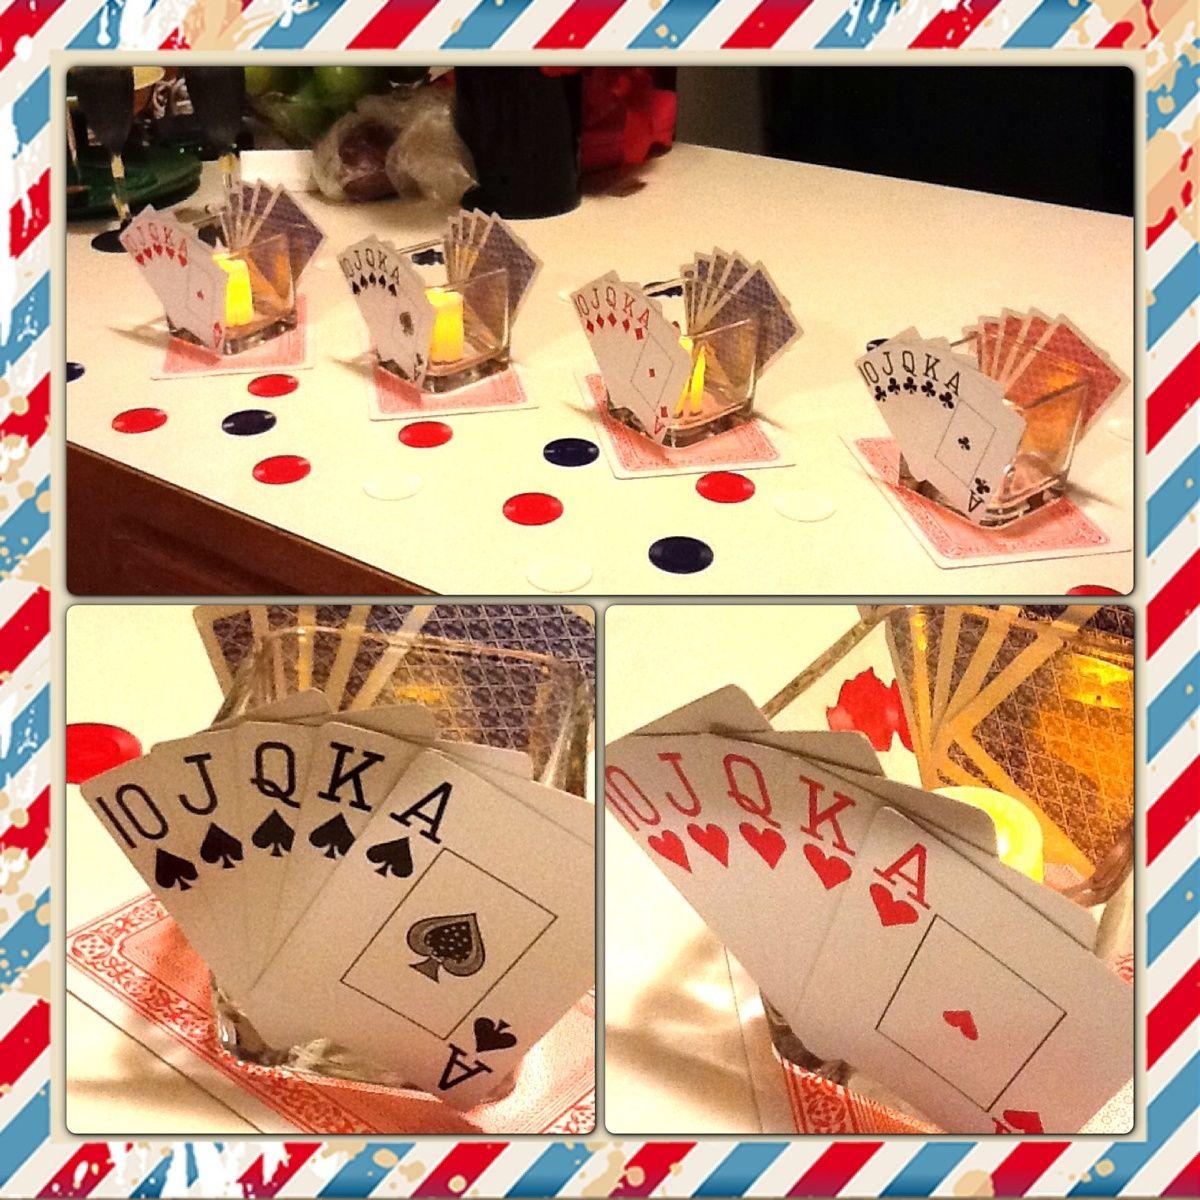 9 Fun Casino Party Games